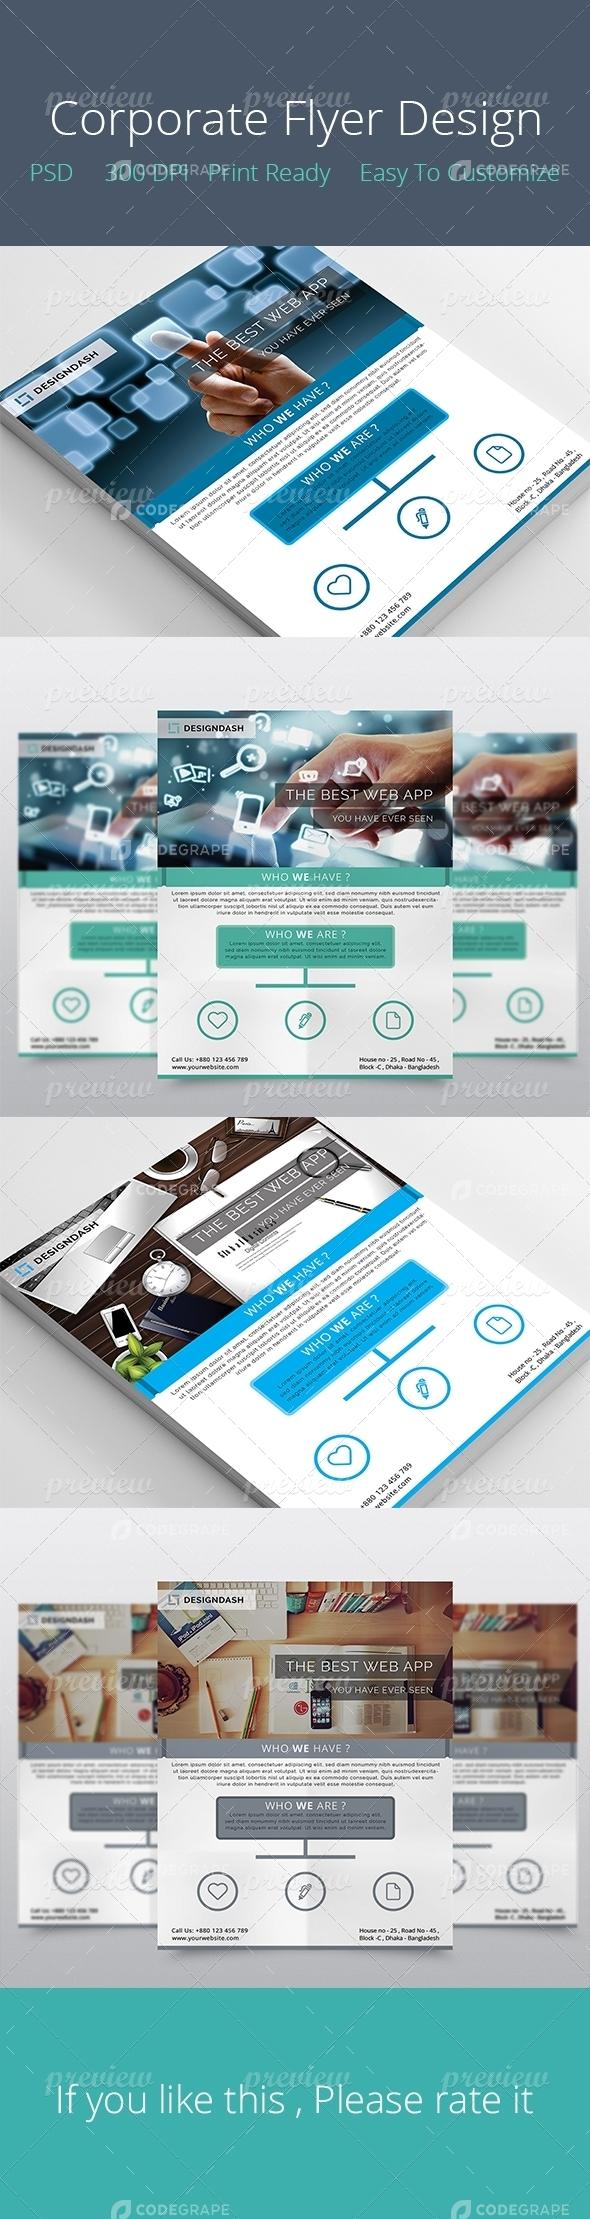 Corporate Flyer Design 2